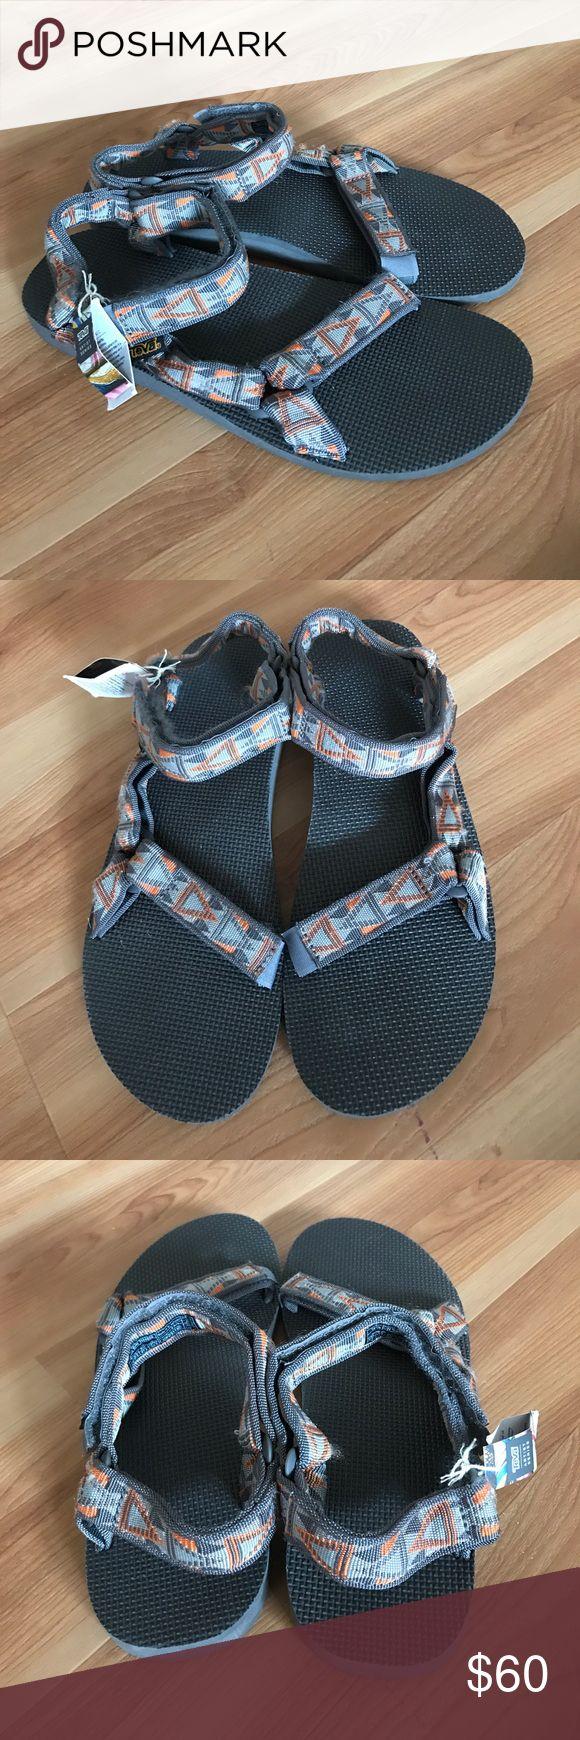 Teva mosaic men's sandals size 13 new Teva mosaic men's sandals size 13 new no box Teva Shoes Sandals & Flip-Flops